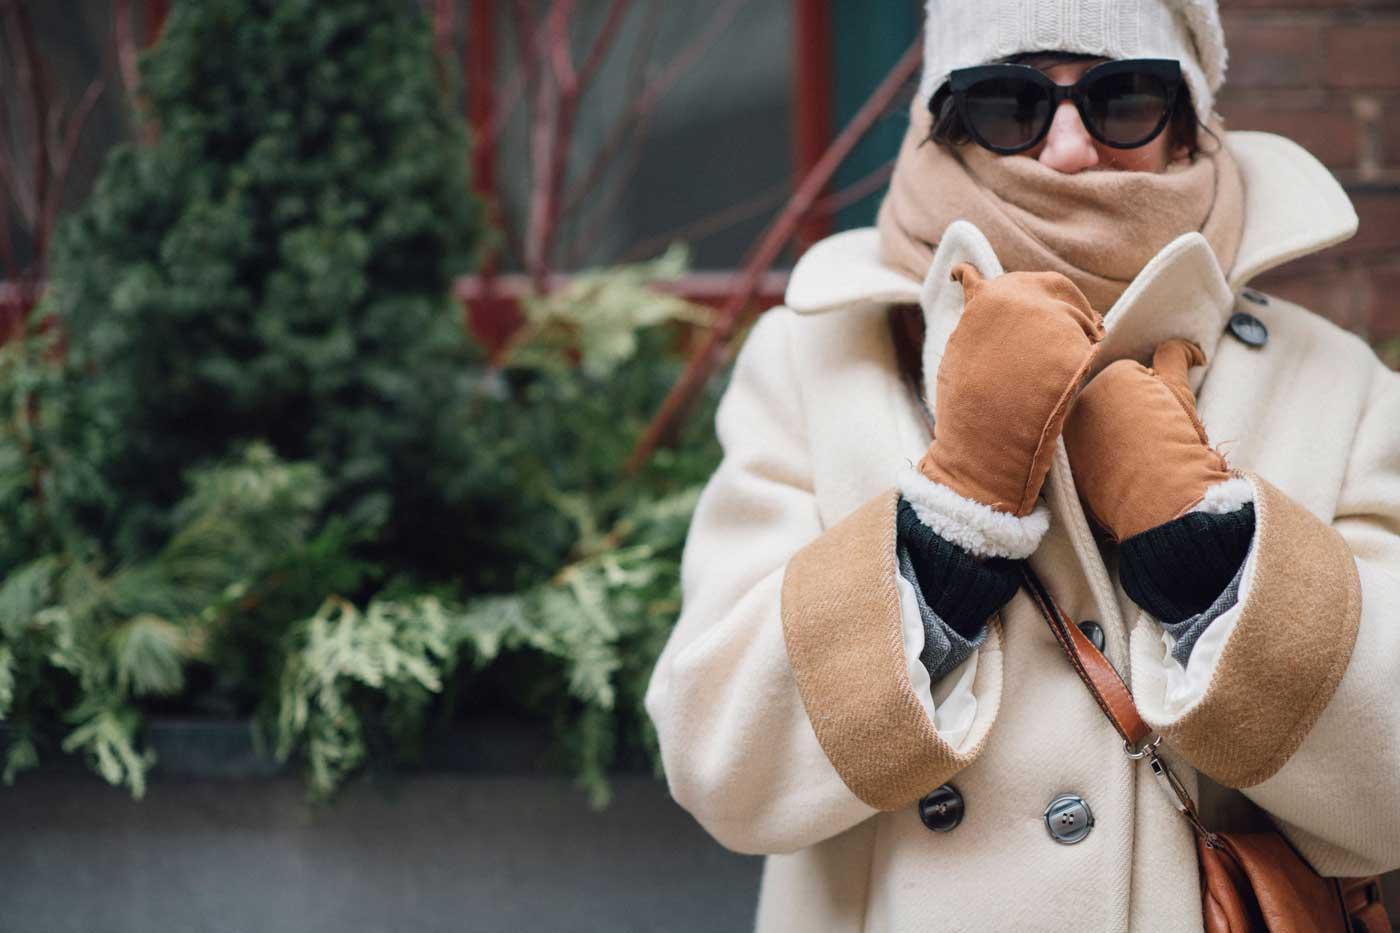 Ethical fashion, slow fashion, ethical fashion blogger, ethical fashion youtuber, slow fashion blogger, slow fashion youtuber, canadian slow fashion blog, canadian slow fashion youtube, how to shop your closet, shop your closet, shop your wardrobe, conscious consumption, conscious consumerism, sustainable fashion, sustainable fashion blogger, canadian sustainable fashion, canadian sustainable fashion youtube, use less, how to use less, use what you have, how to use what you have, sustainable style, buy less choose well, capsule closet, Sustainable gift guide, sustainable christmas gift guide 2020, sustainable christmas gift ideas 2020, holiday gift guide 2020, mindful holiday gift guide 2020, sustainable gifts for everyone 2020,